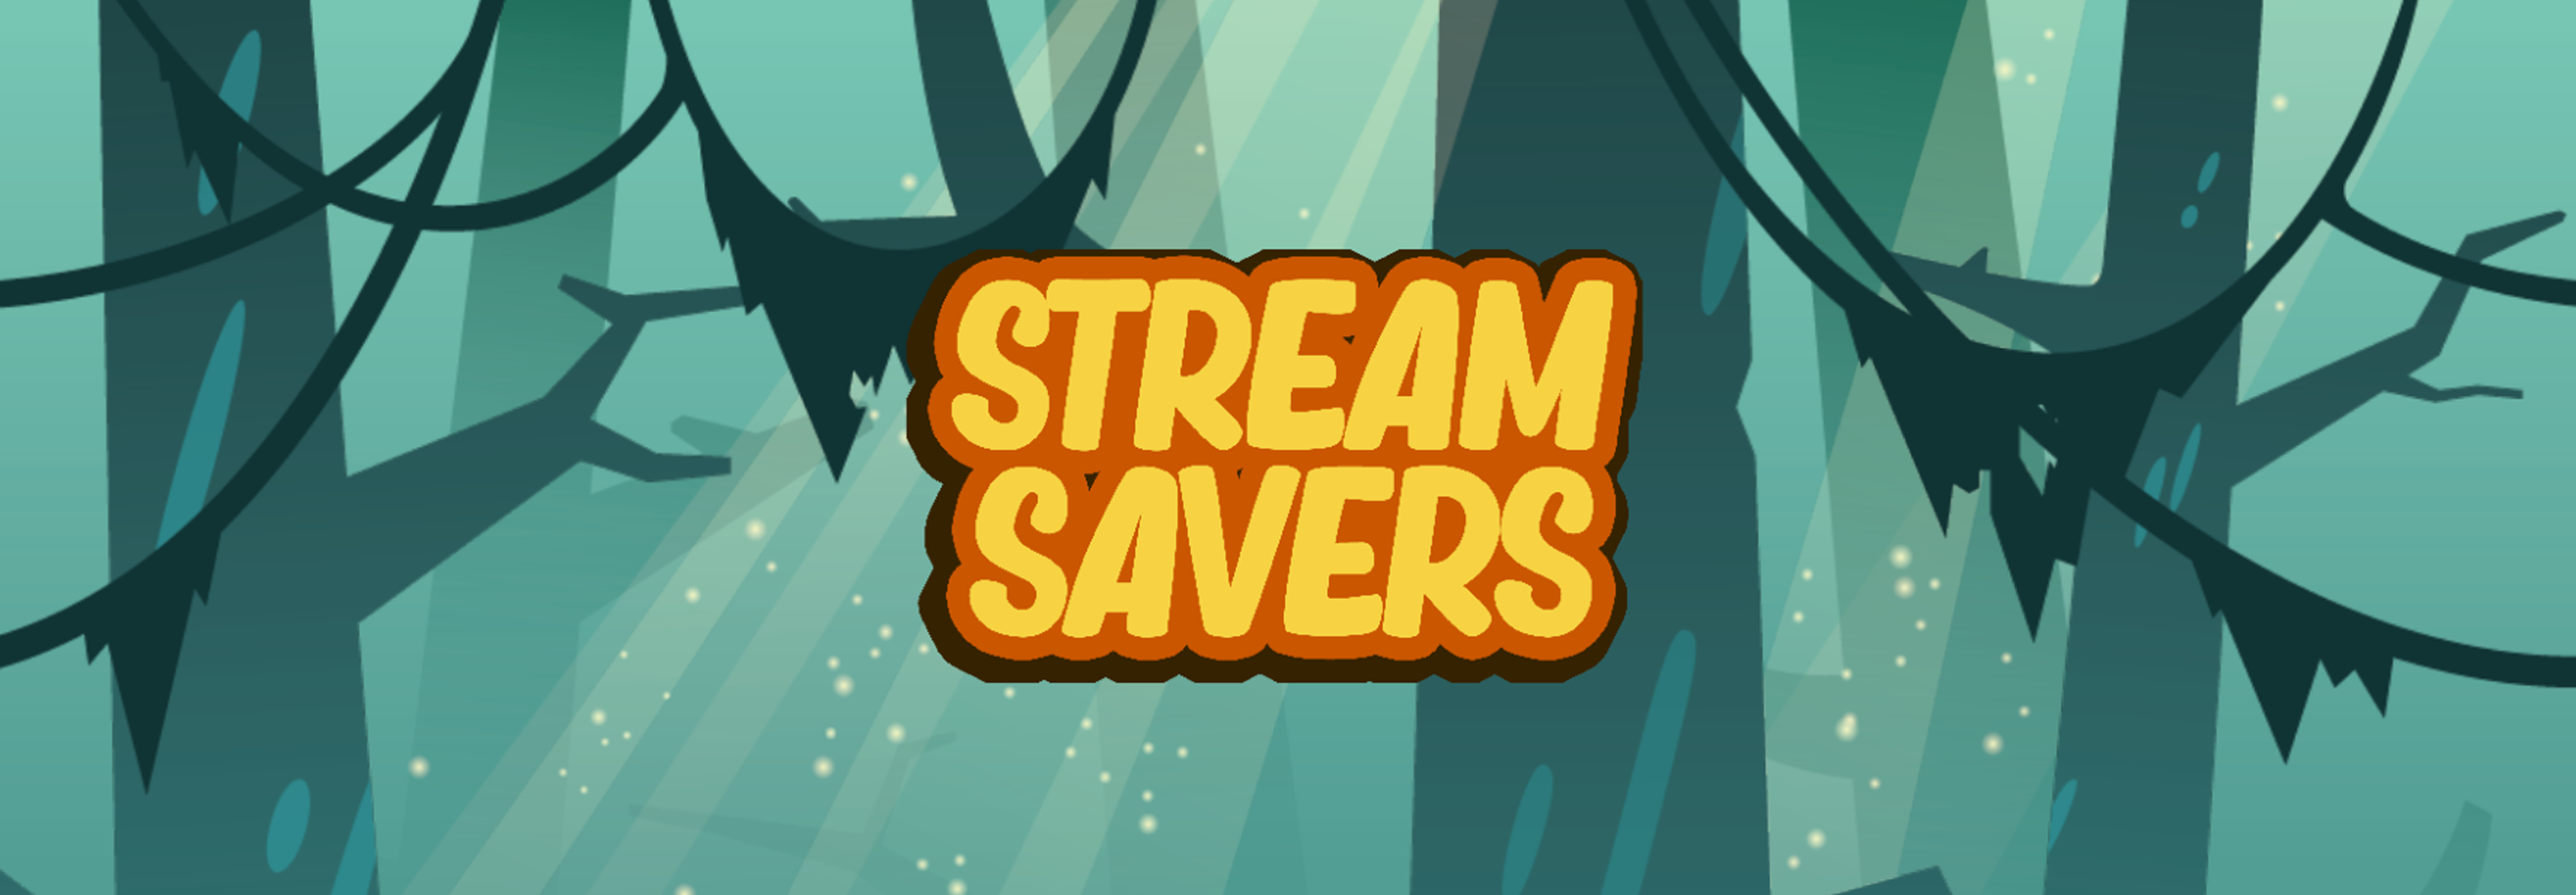 StreamSavers